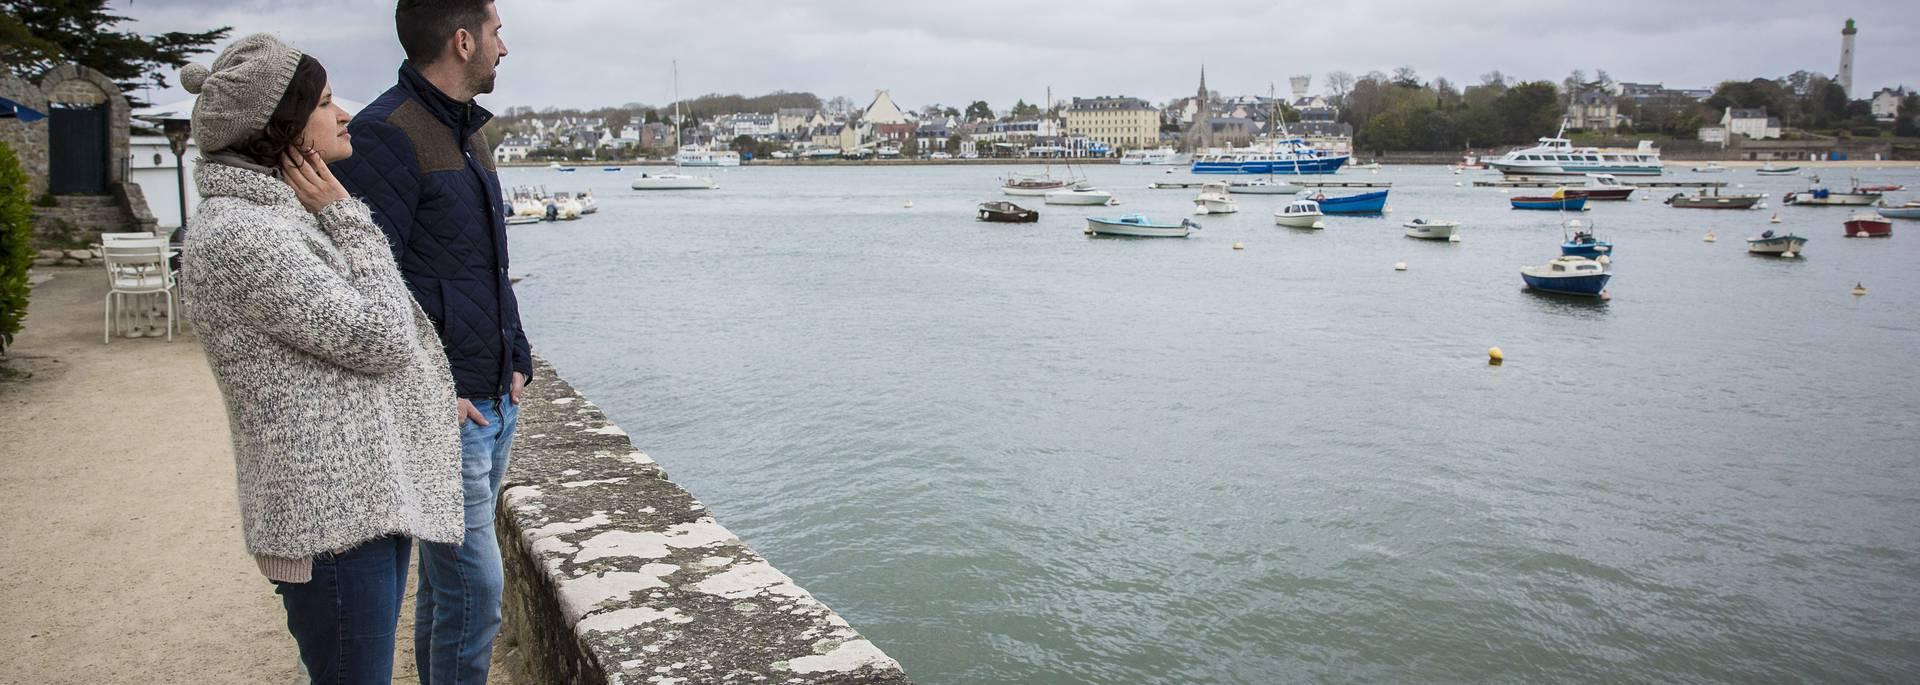 Port de Combrit Sainte-Marine, Pays Bigouden ©Y Derennes